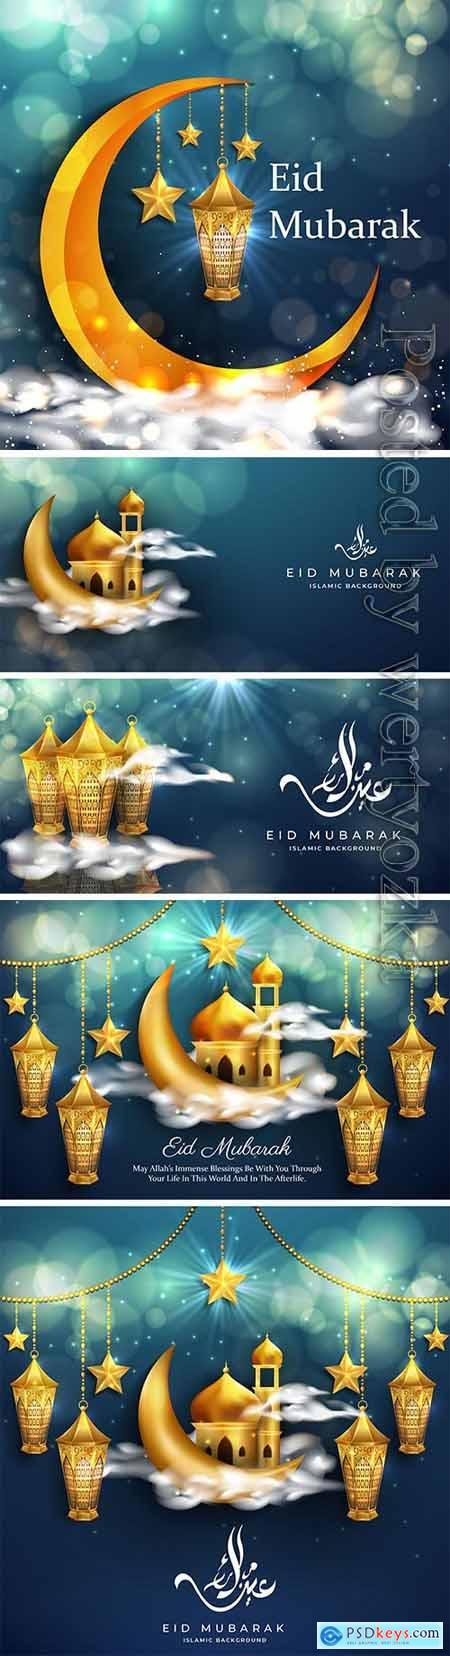 Eid mubarak background with realistic golden lanterns